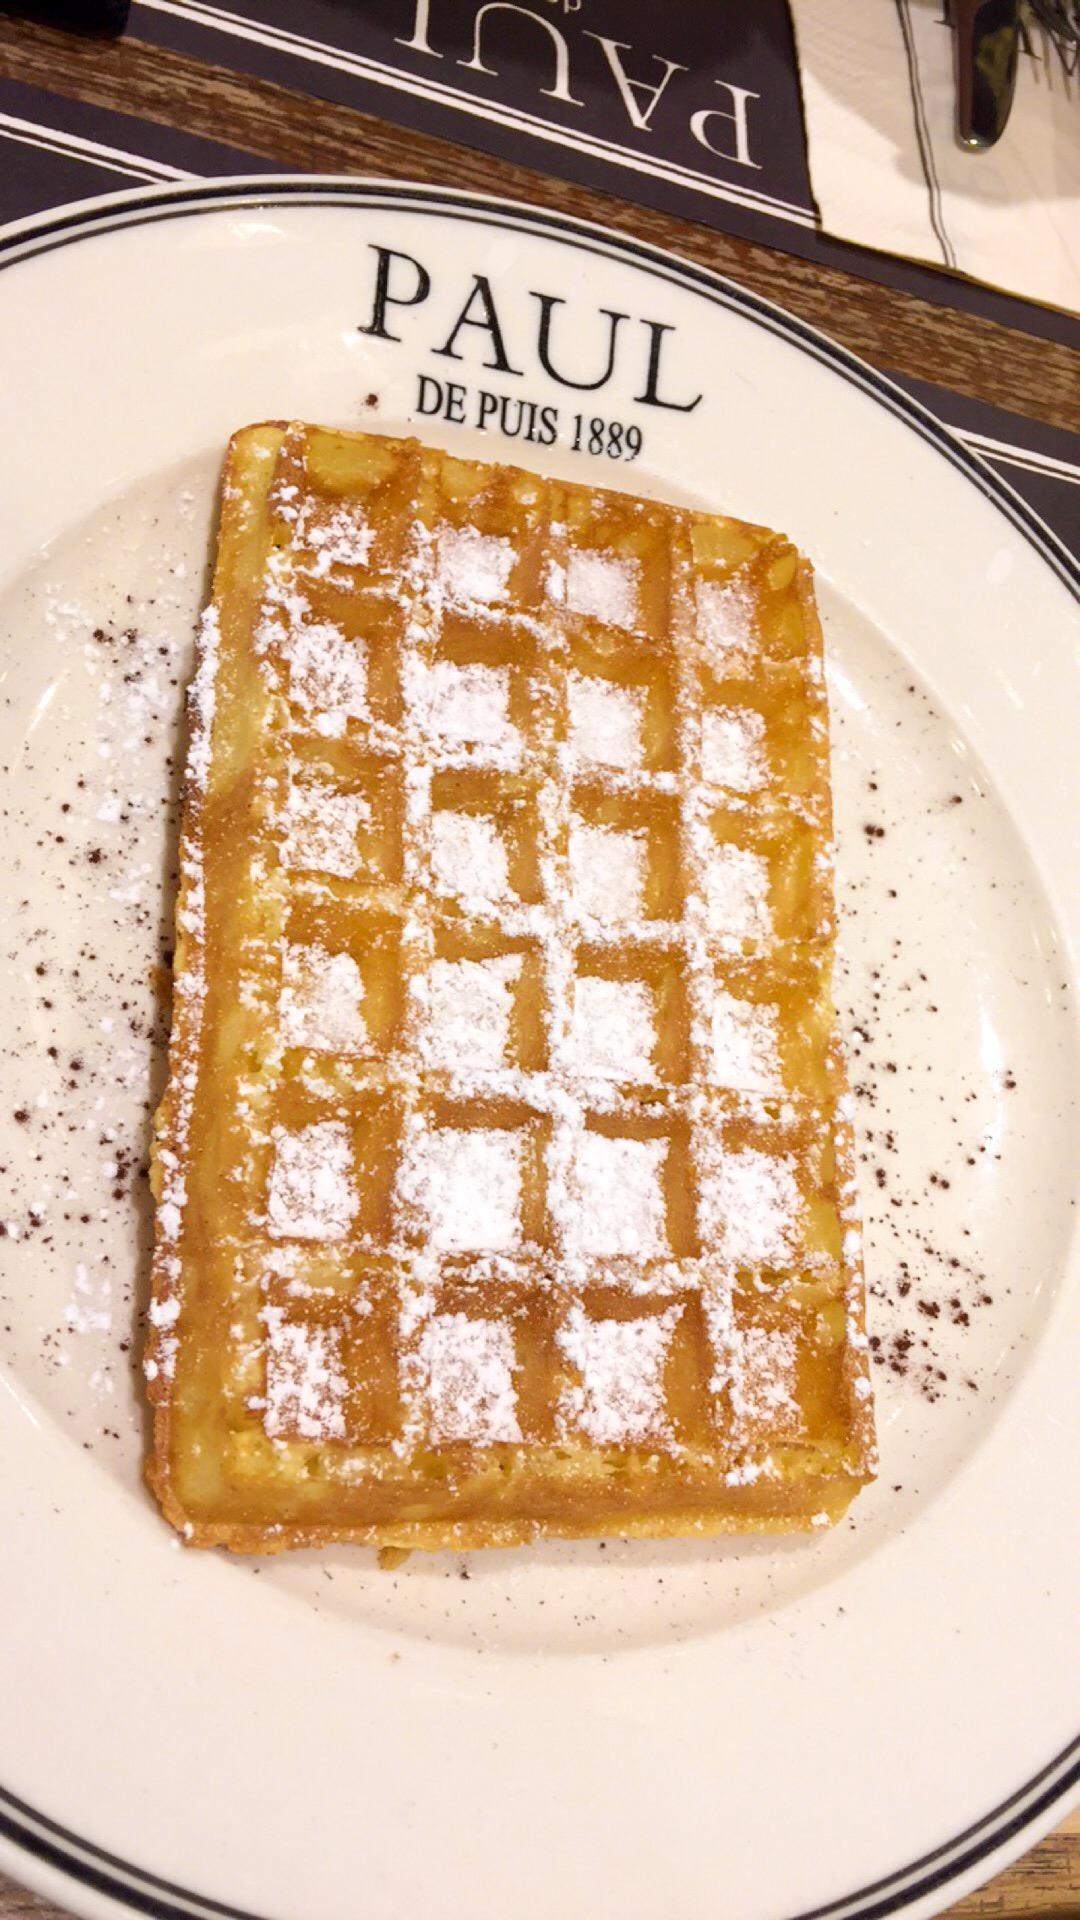 Paul 1889 Waffle